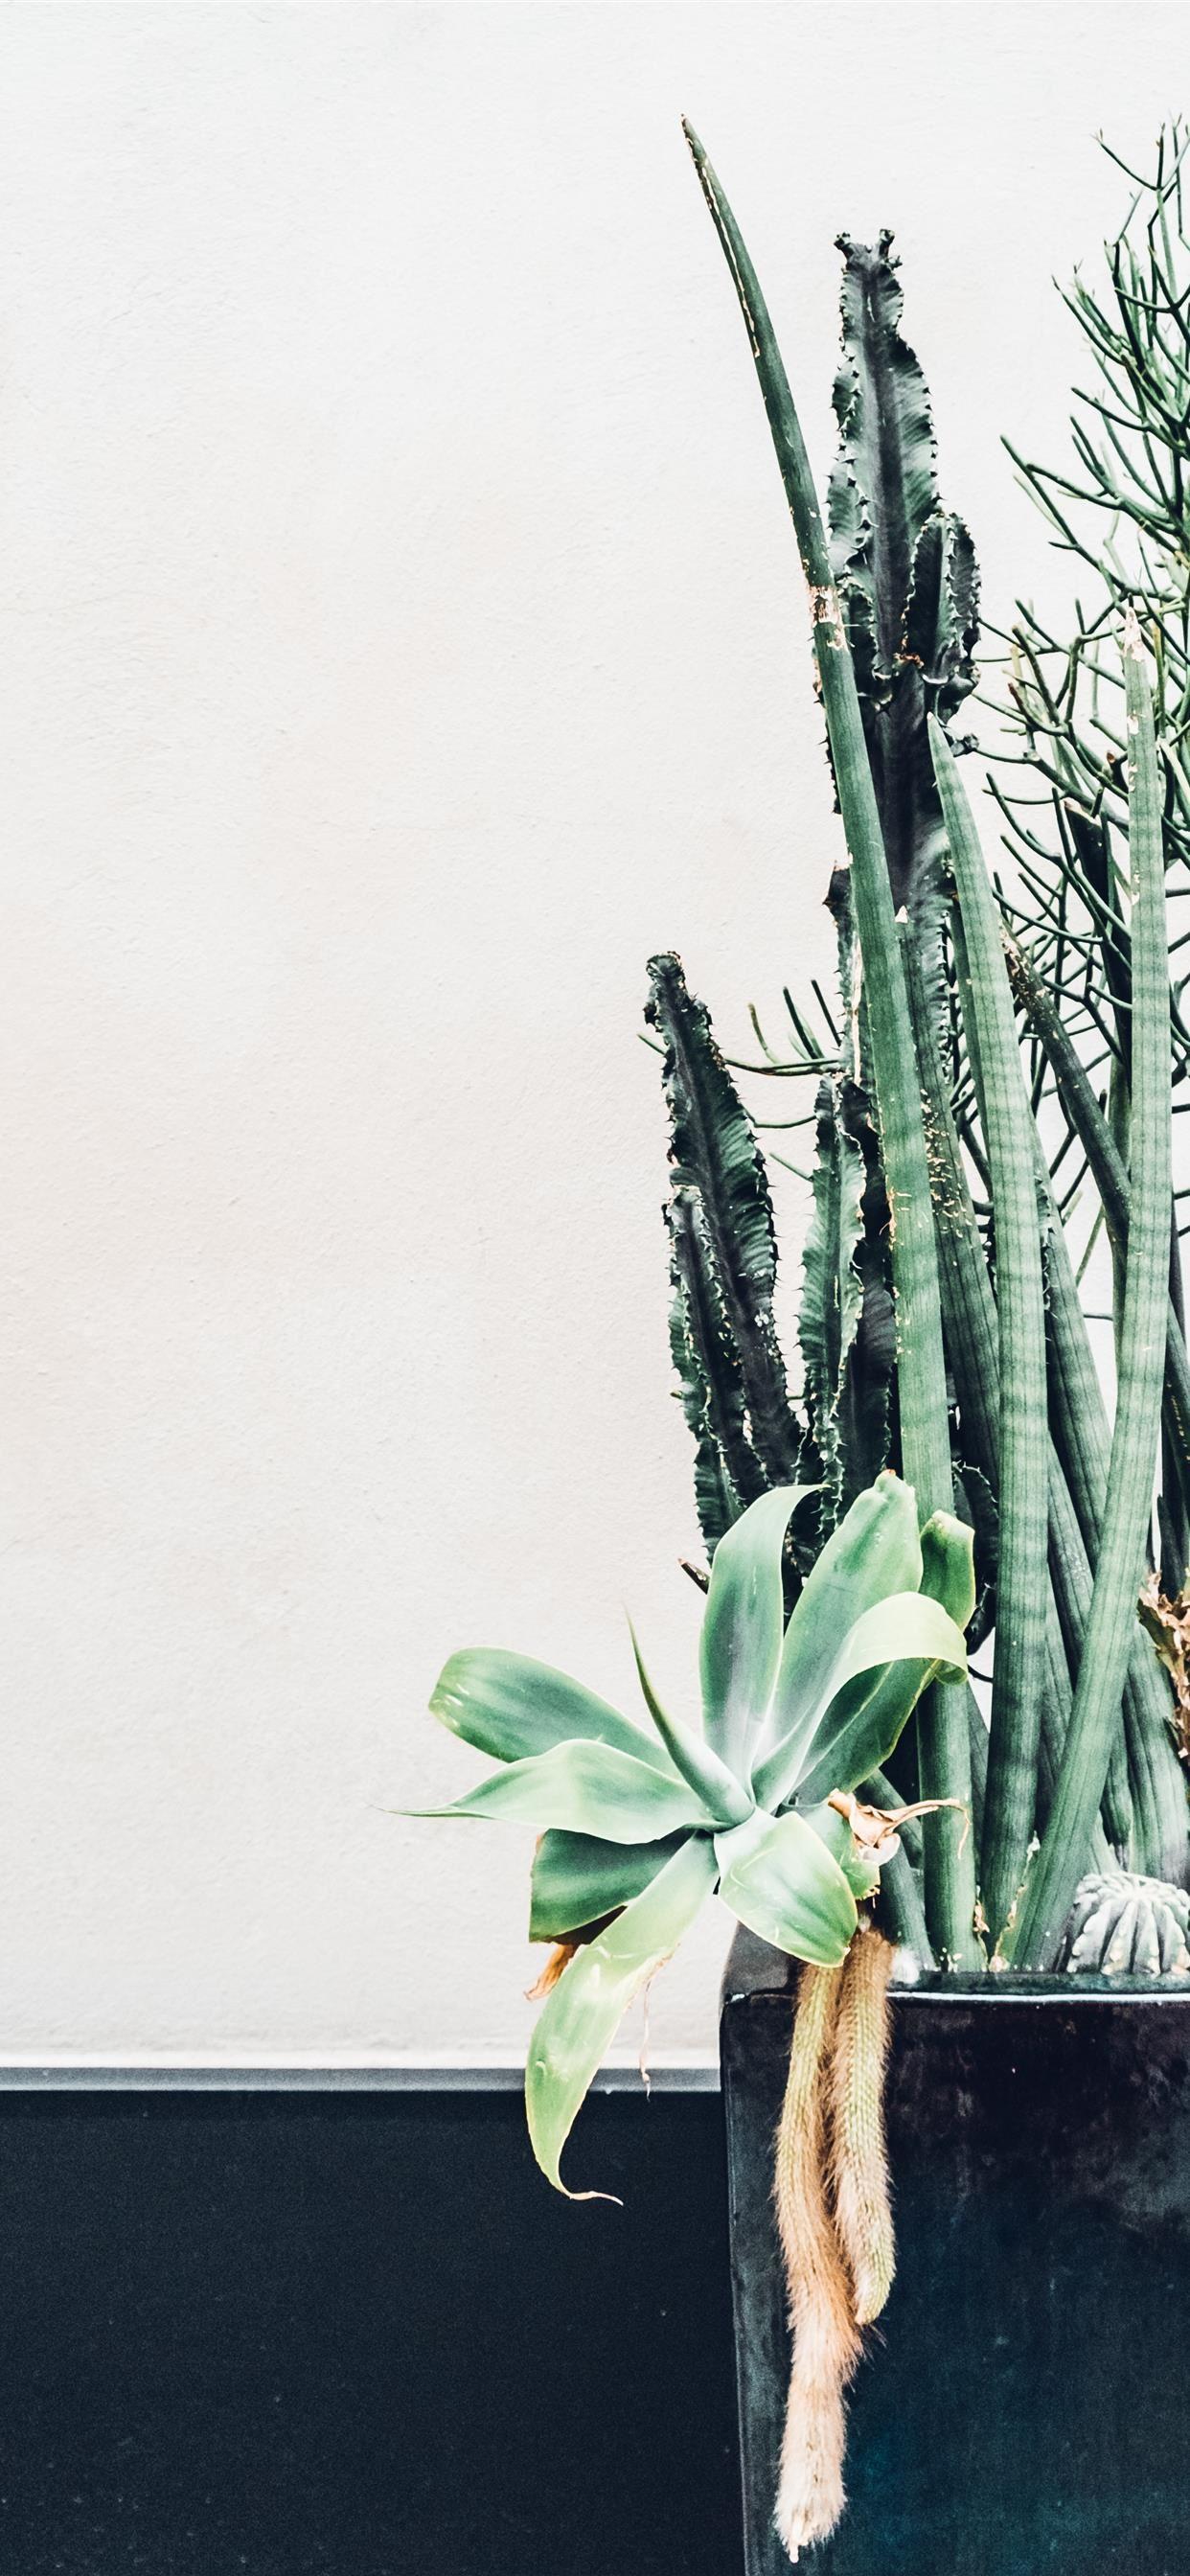 City Cacti Iphone X Wallpaper Download Iphone Wallpapers Ipad